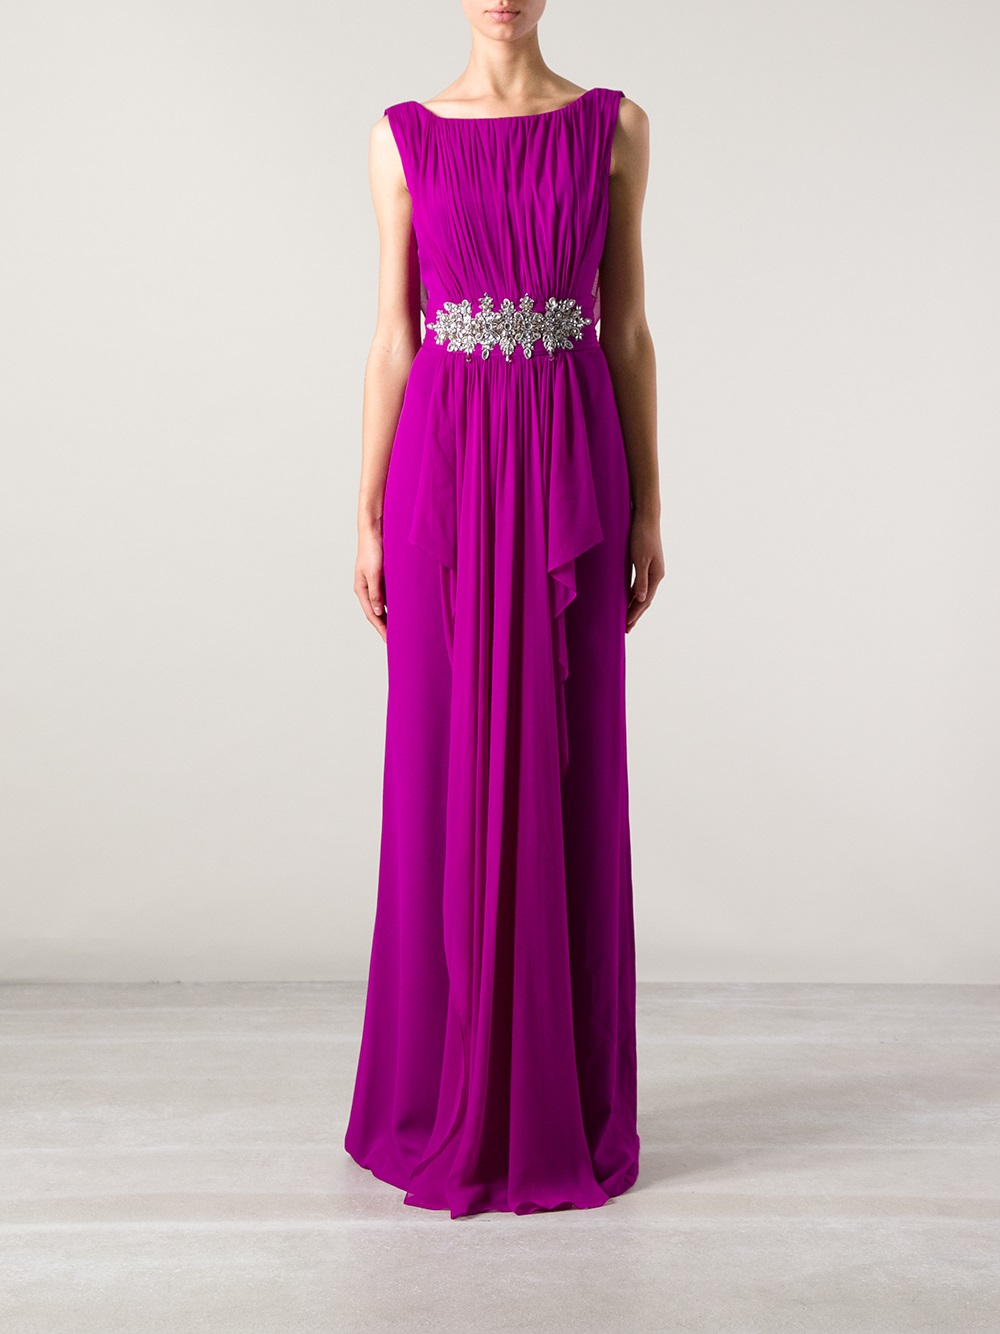 Lyst Marchesa Marchesa Embellished Evening Dress In Purple